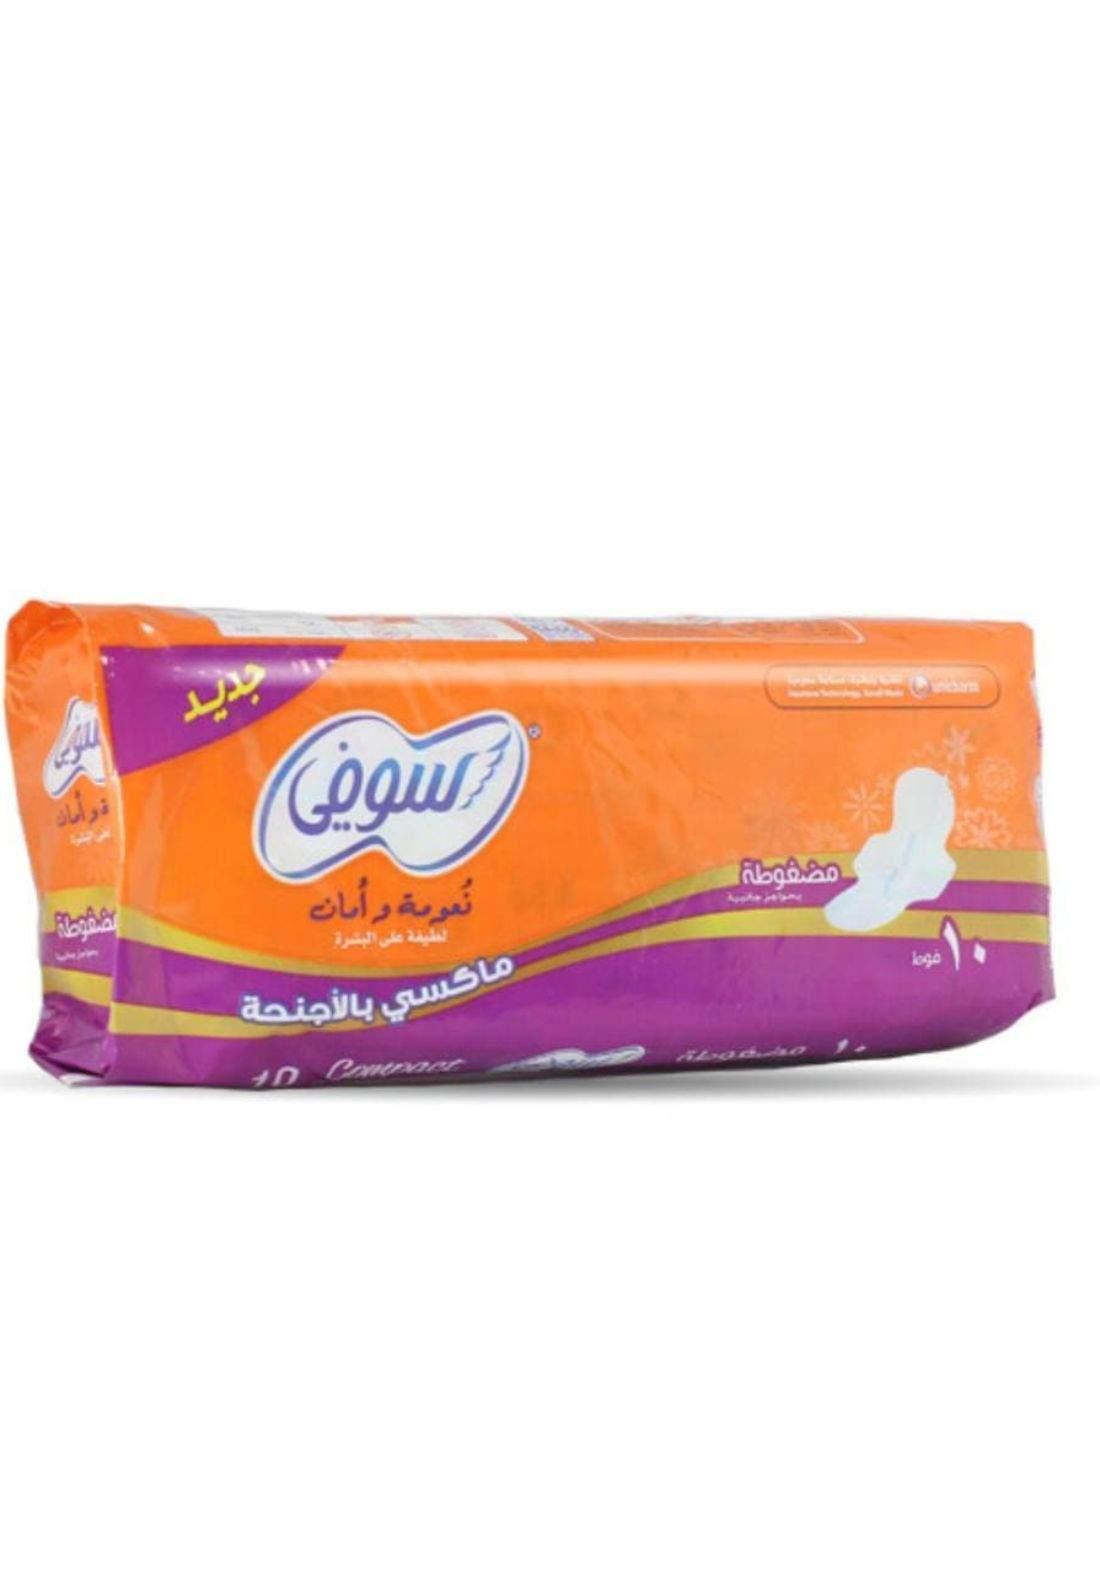 Sofy scented sanitary pads X10 فوطة نسائية